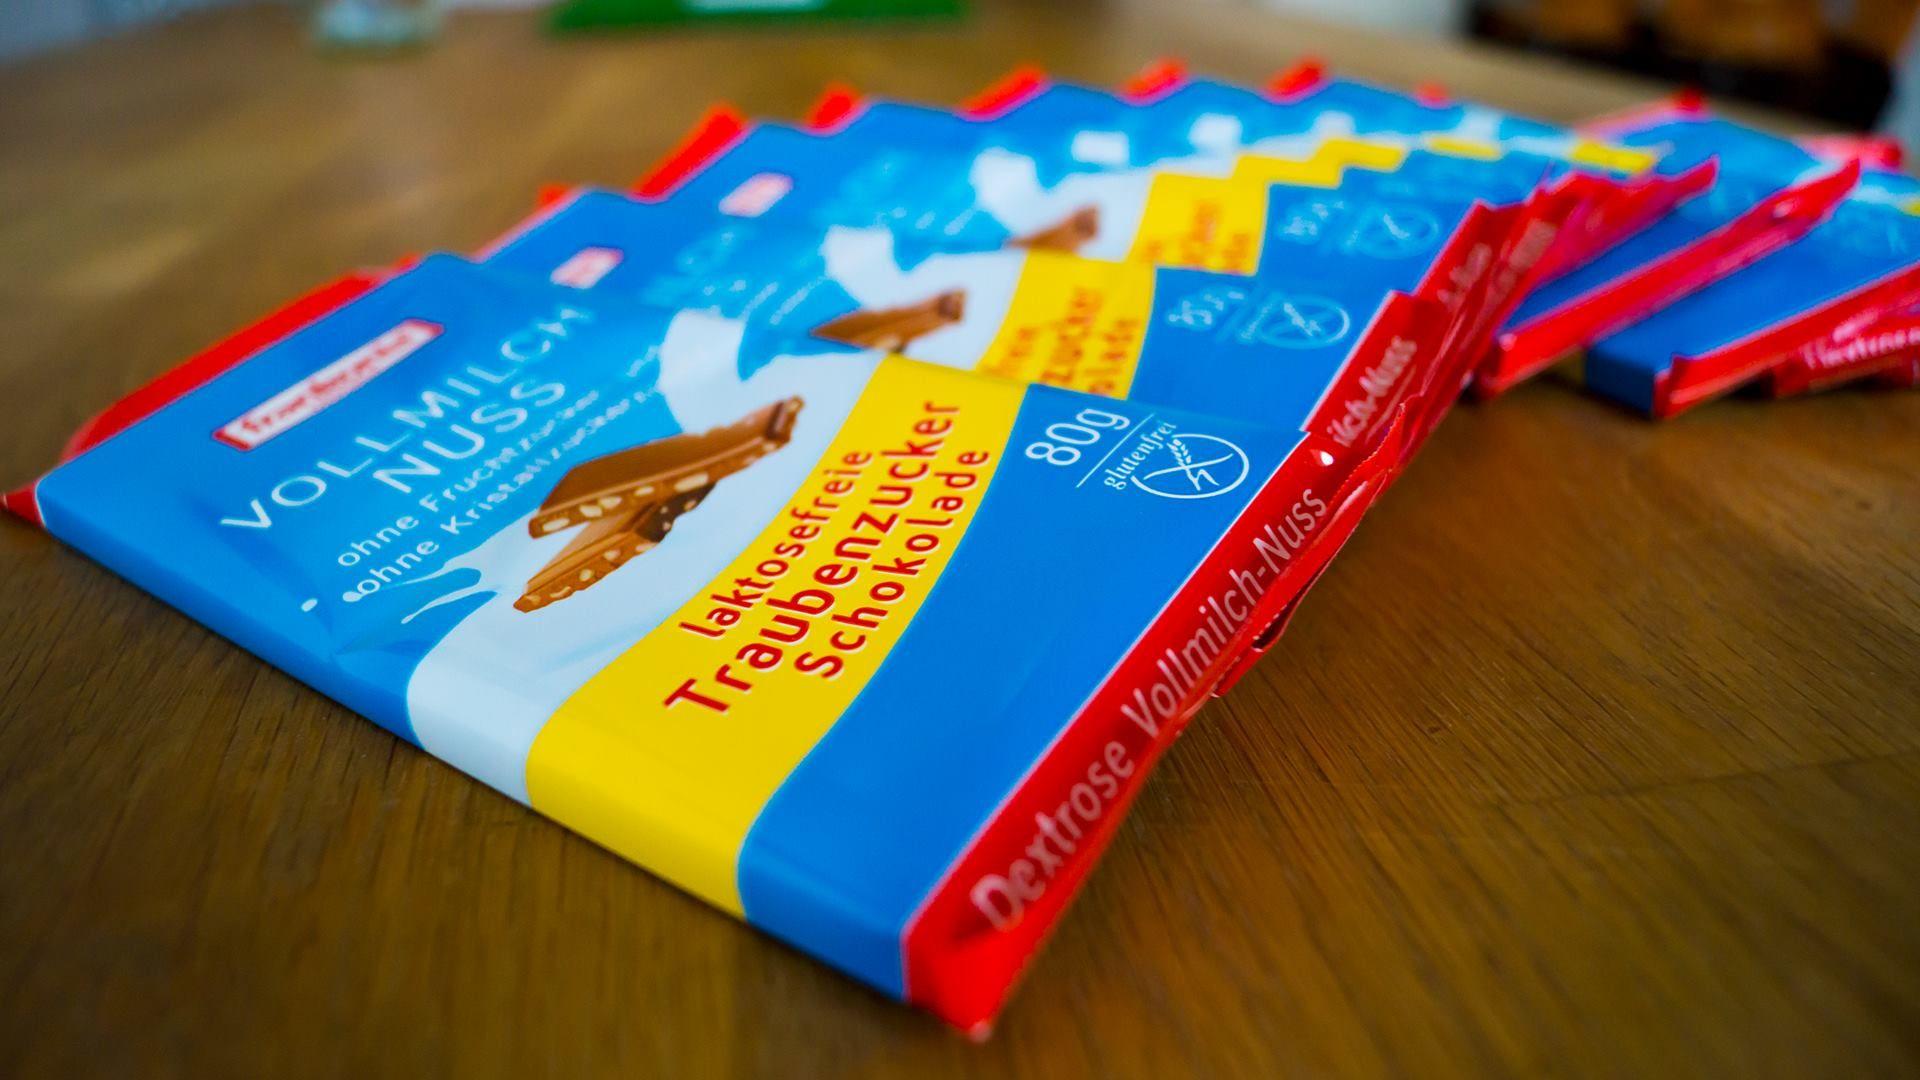 Frankonia Vollmilch Nuss Schokolade